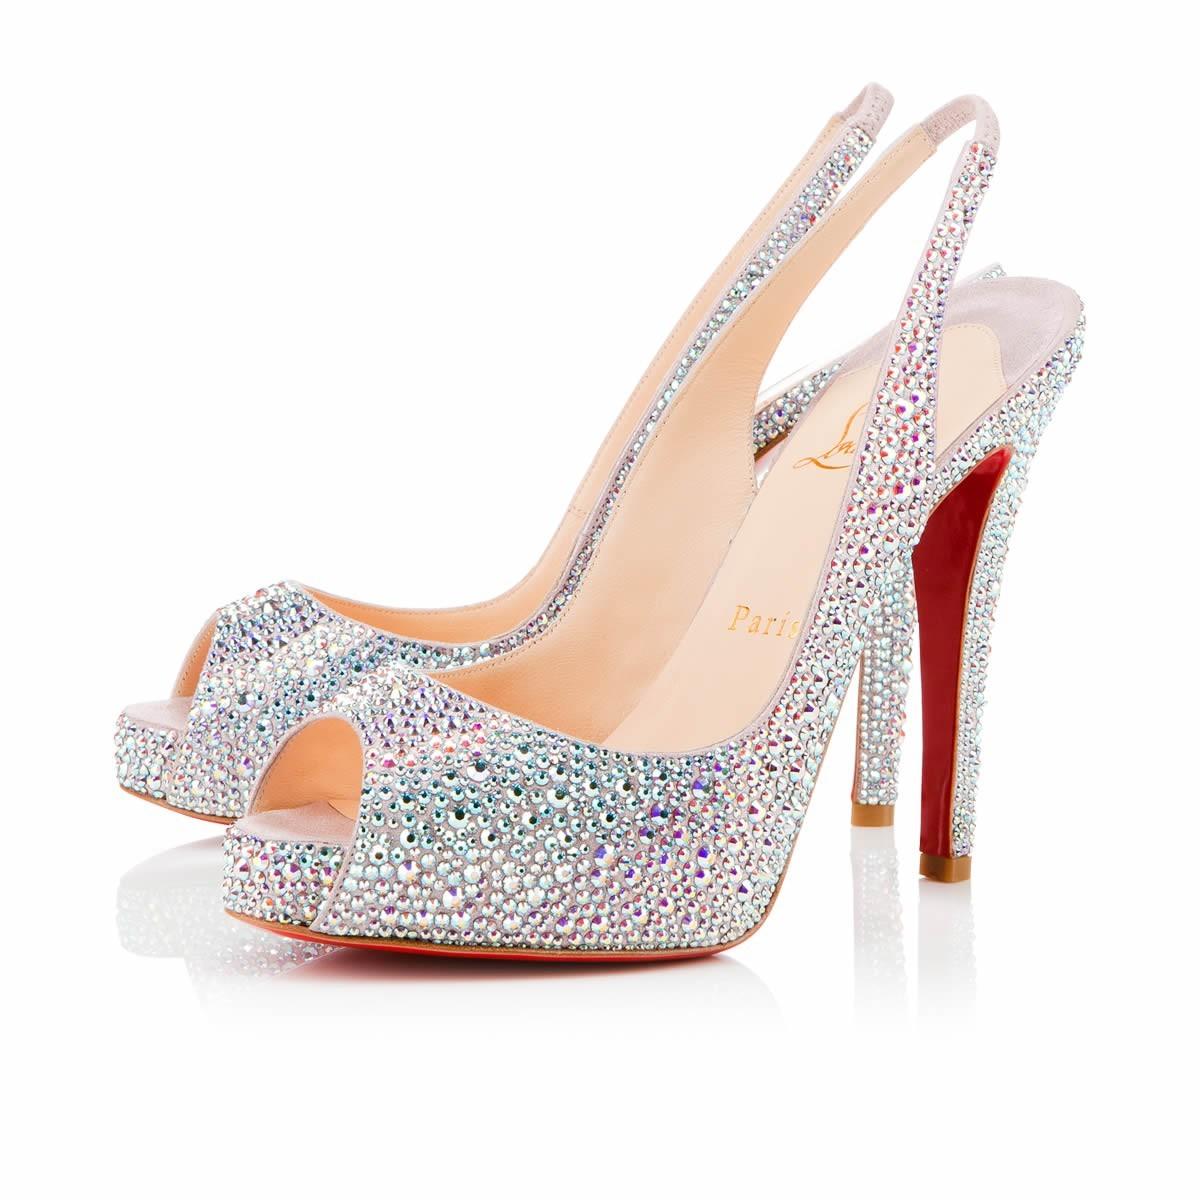 Christian Louboutin heels white glitter platform peep toe slingback